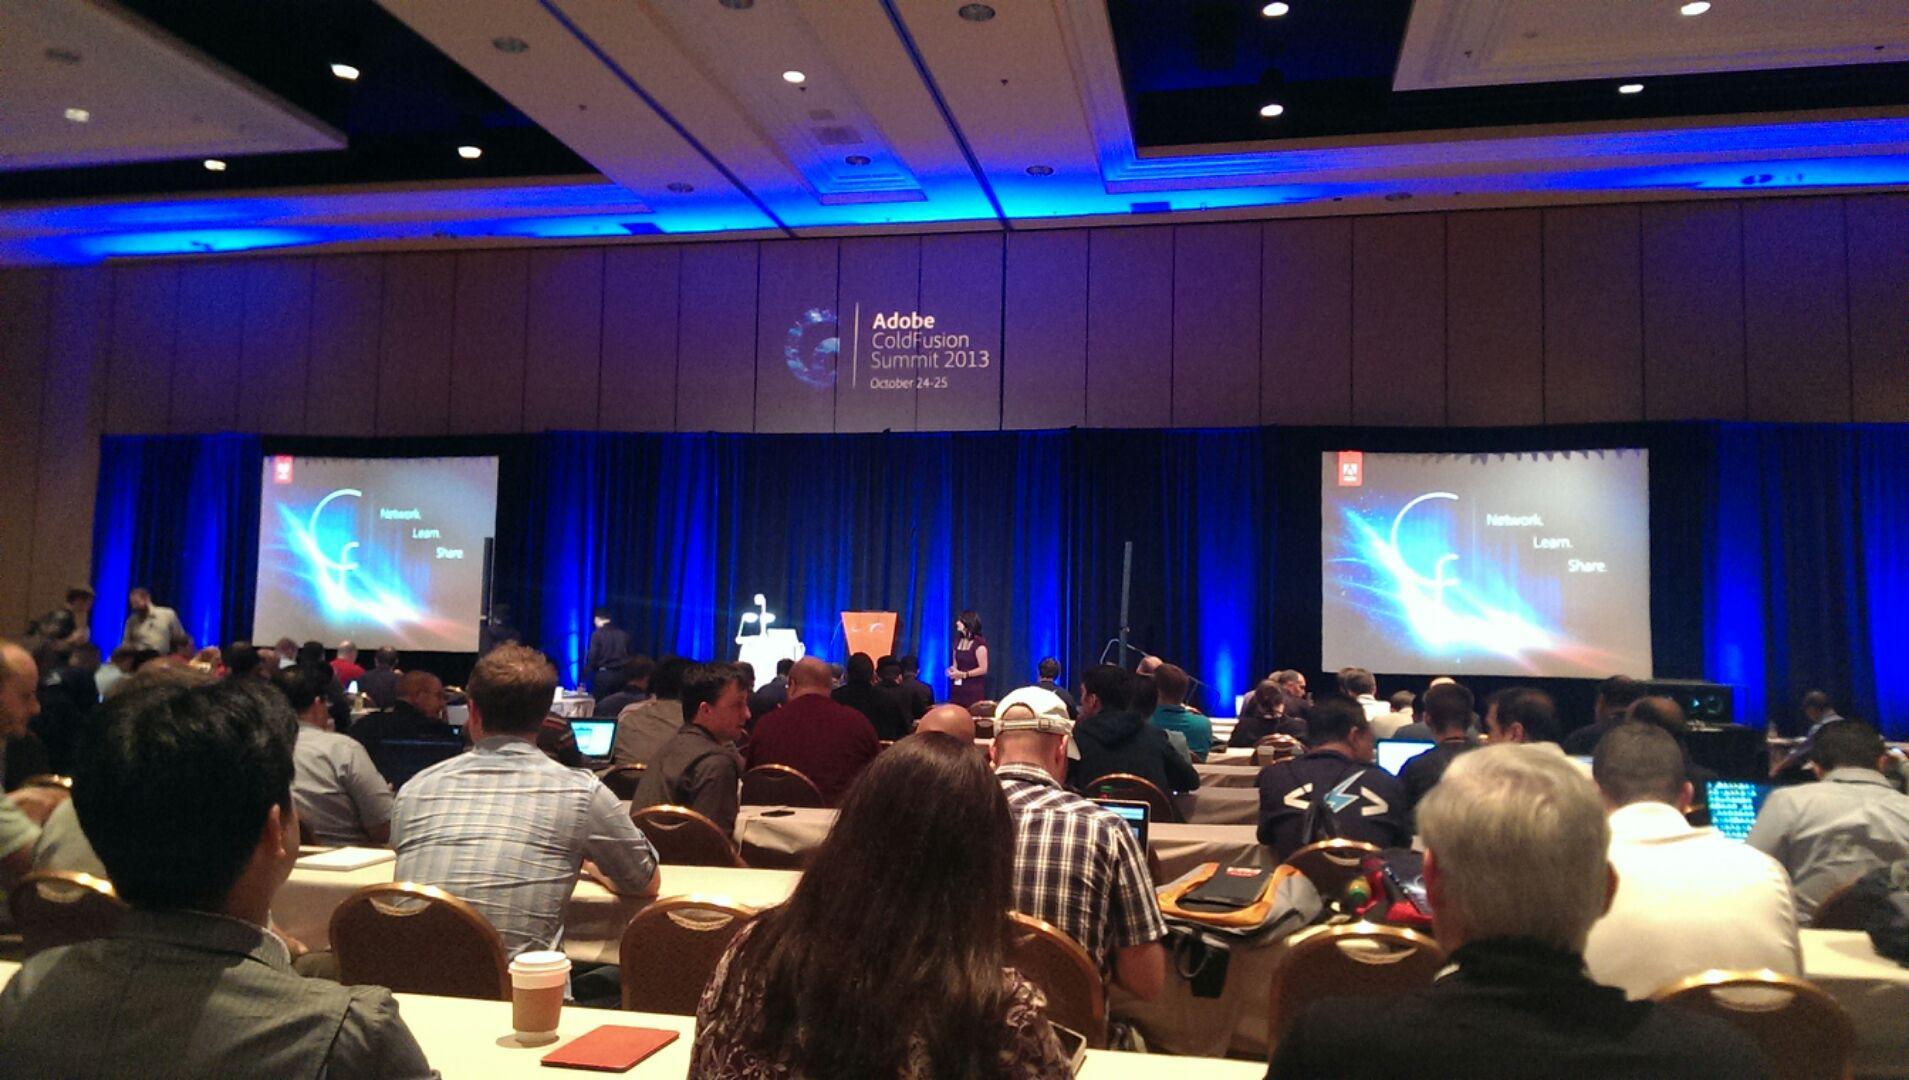 Adobe ColdFusion Summit Las Vegas